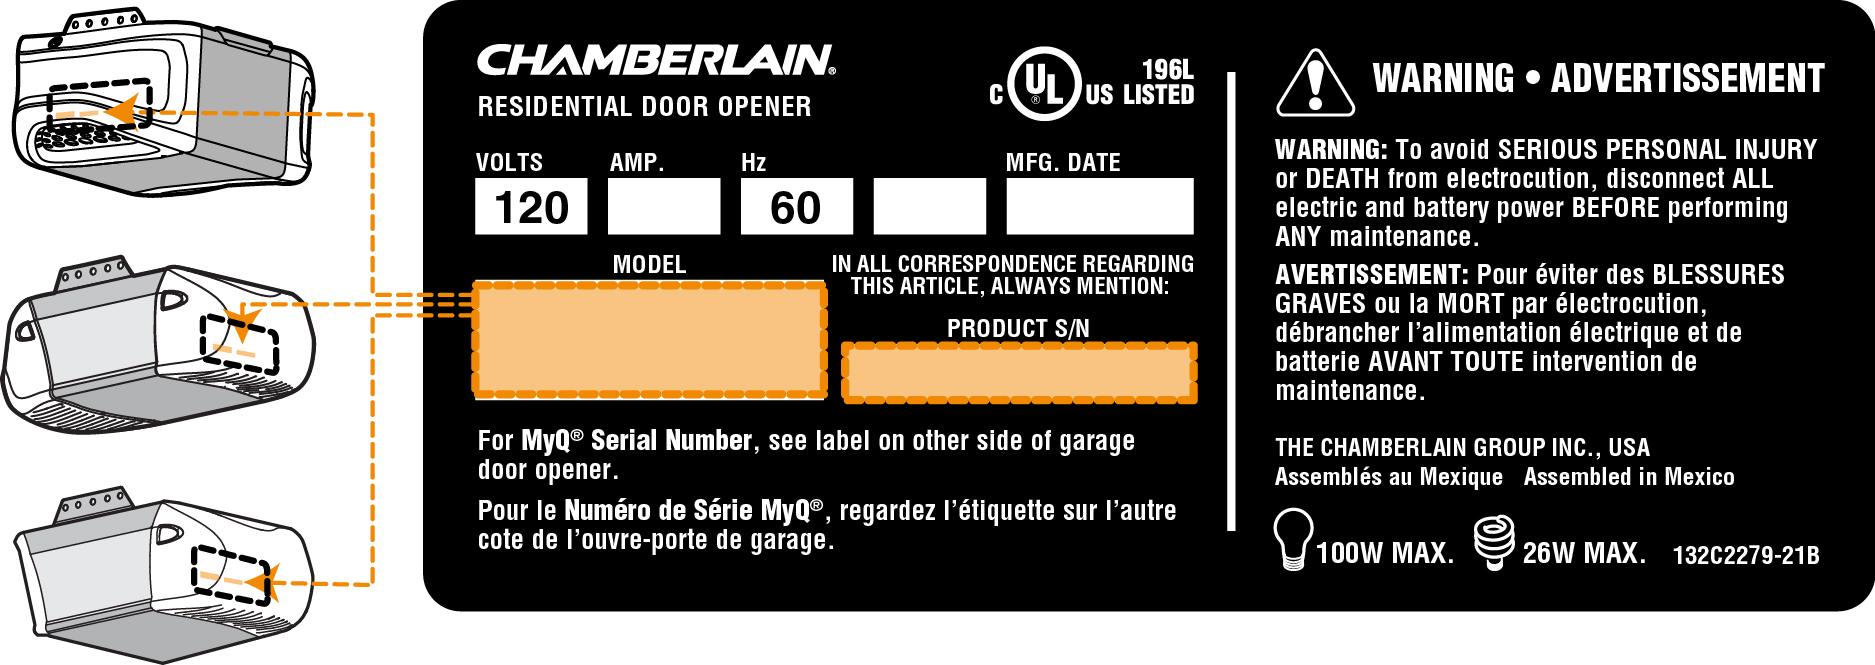 Register a product chamberlain register your chamberlain product today rubansaba